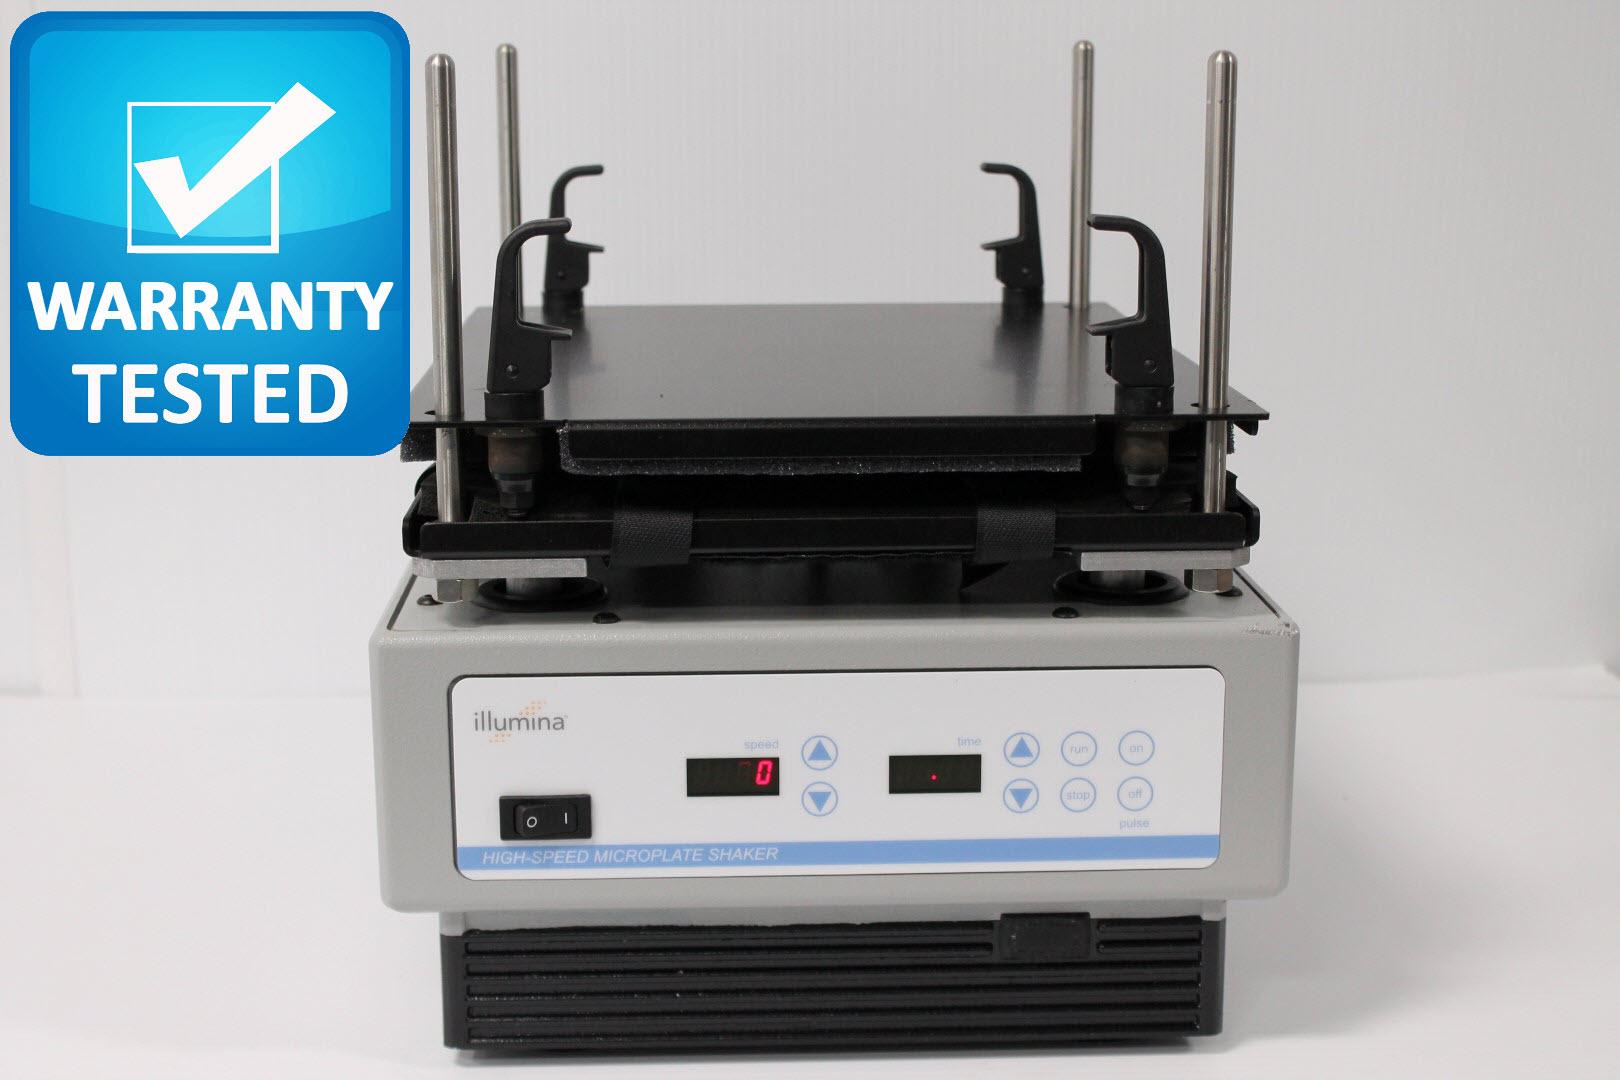 VWR Illumina HSMPS High Speed Microplate Shaker 945190